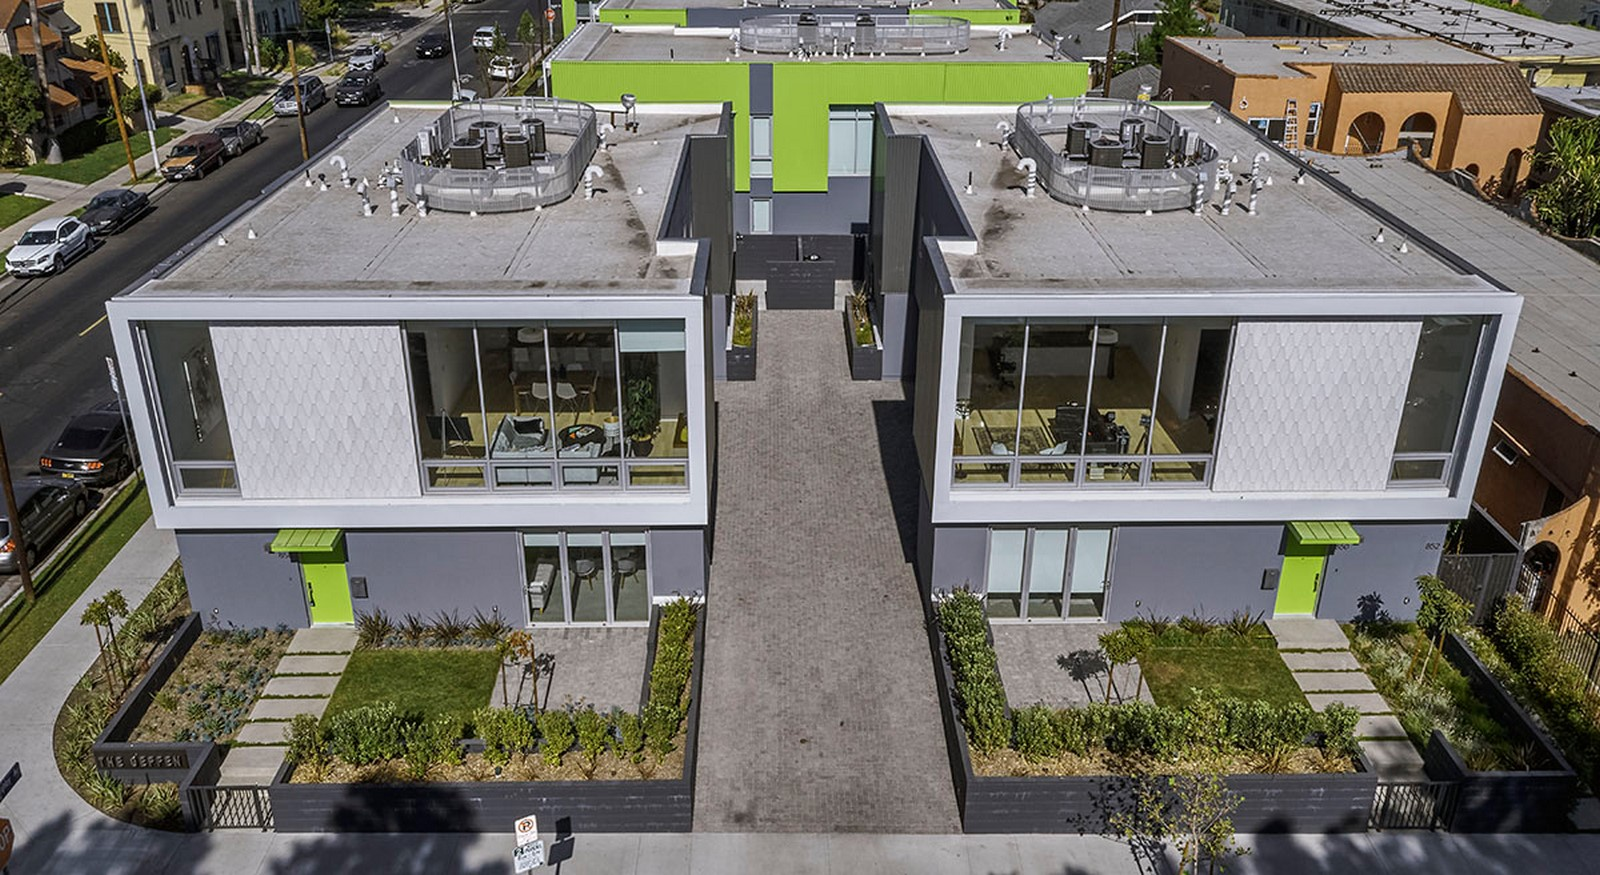 5115 Willoughby Duplexes by Shubin Donaldson: Sheet 1